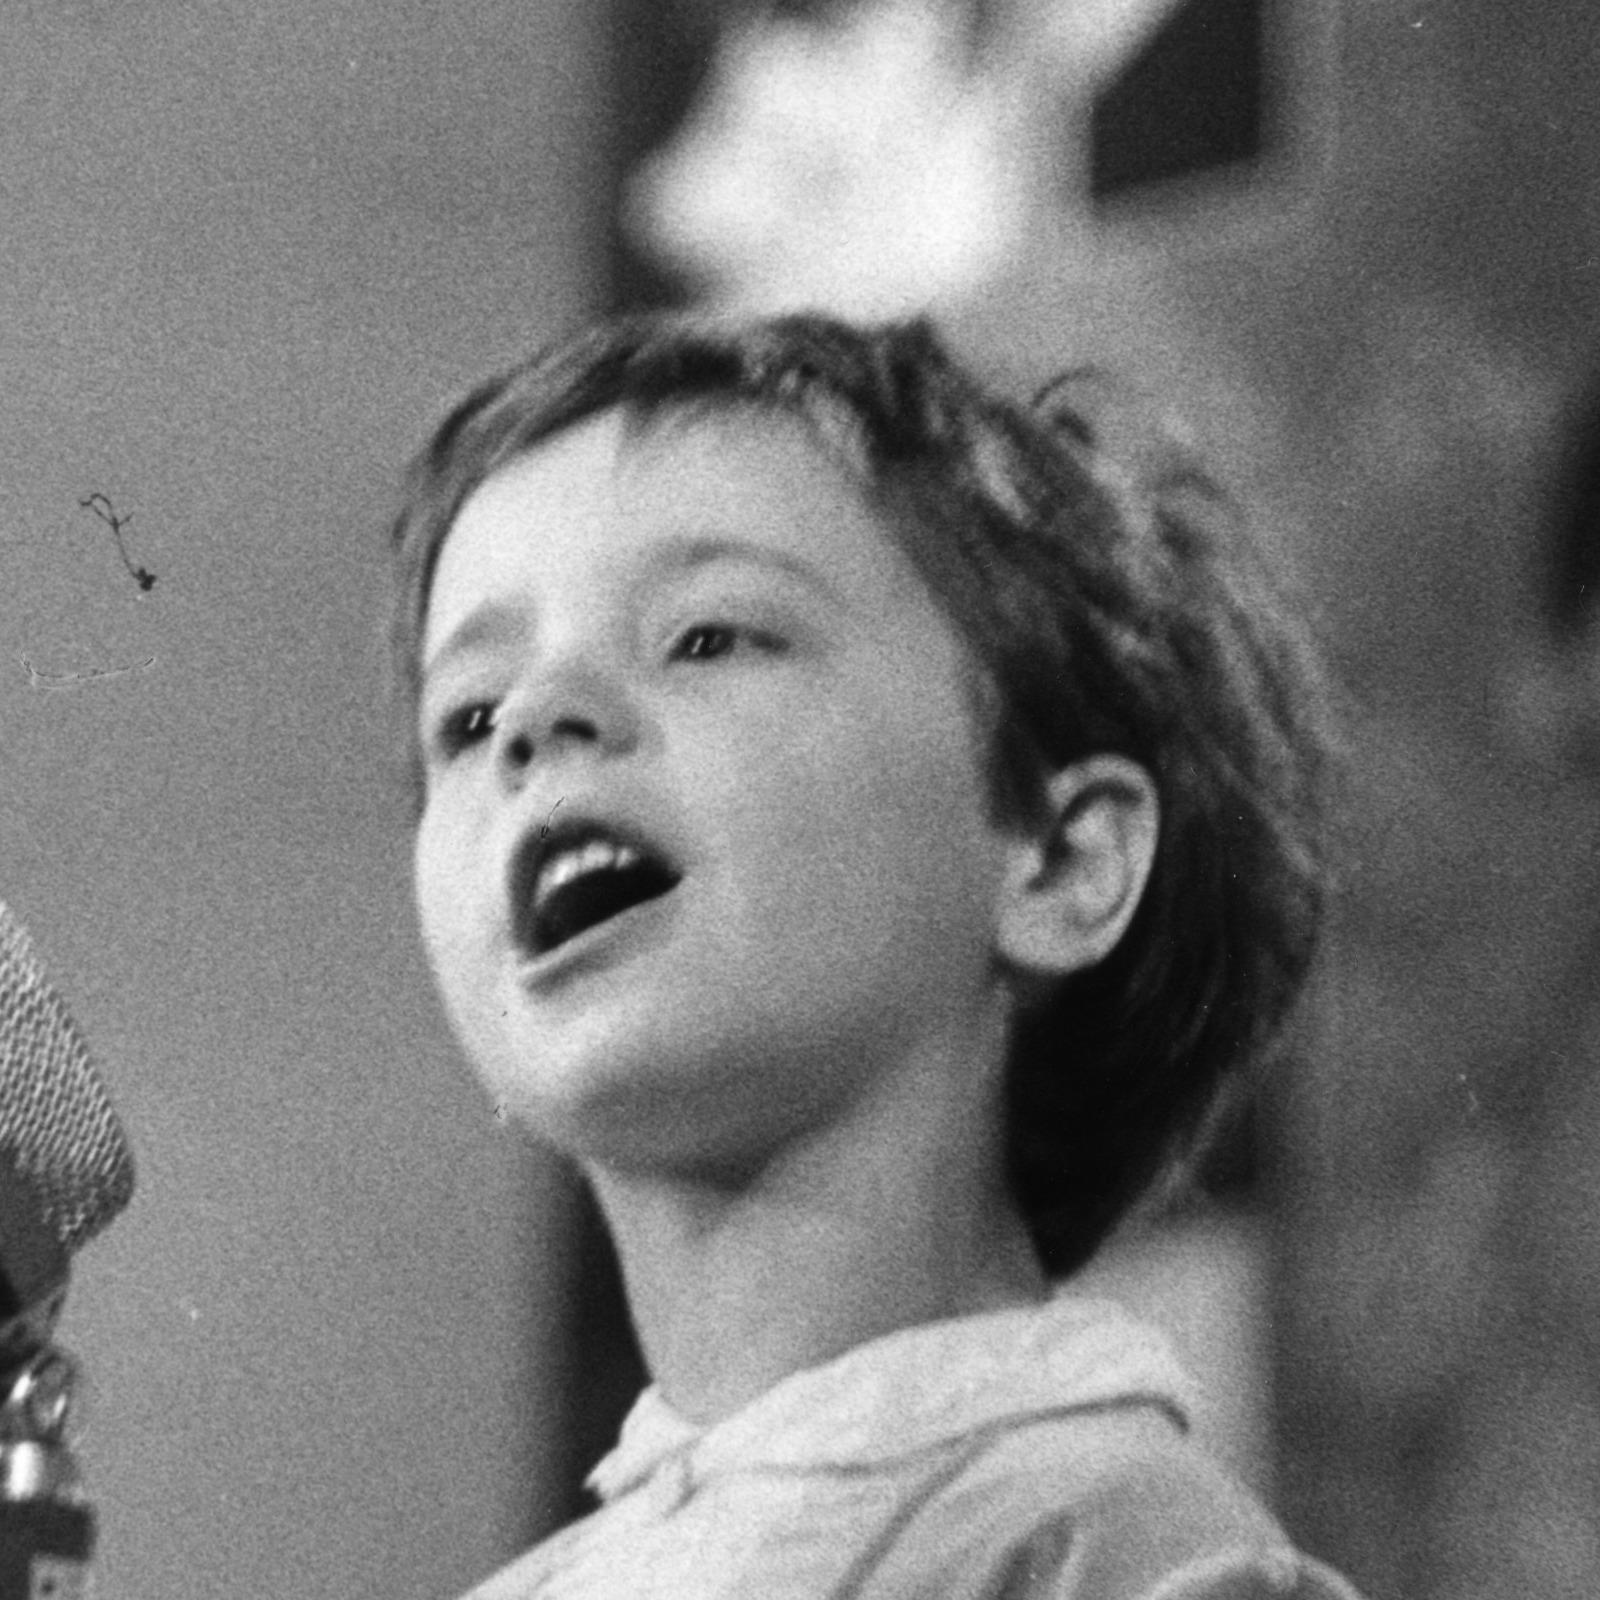 6 Z.O 1964 Il pulcino ballerino - Viviana Stucchi